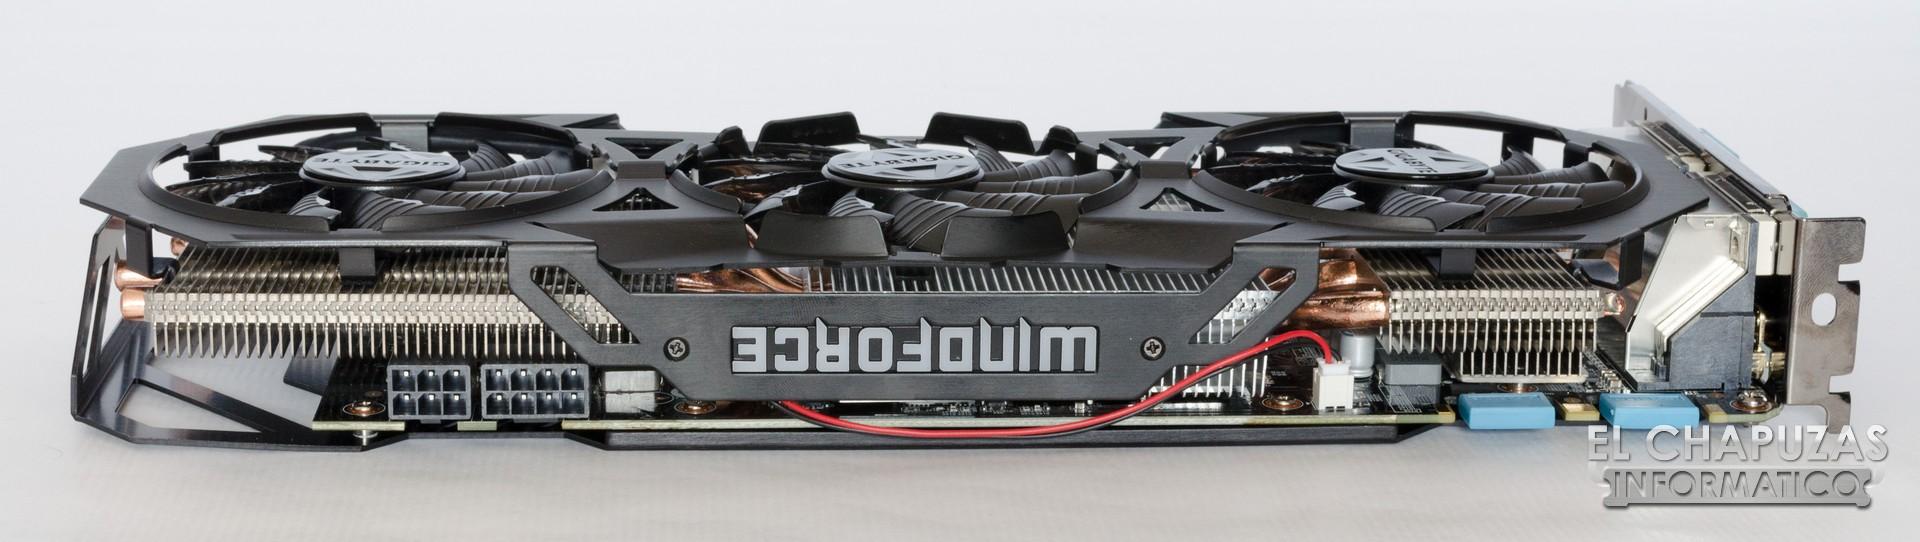 Gigabyte GeForce GTX 970 G1 Gaming 10